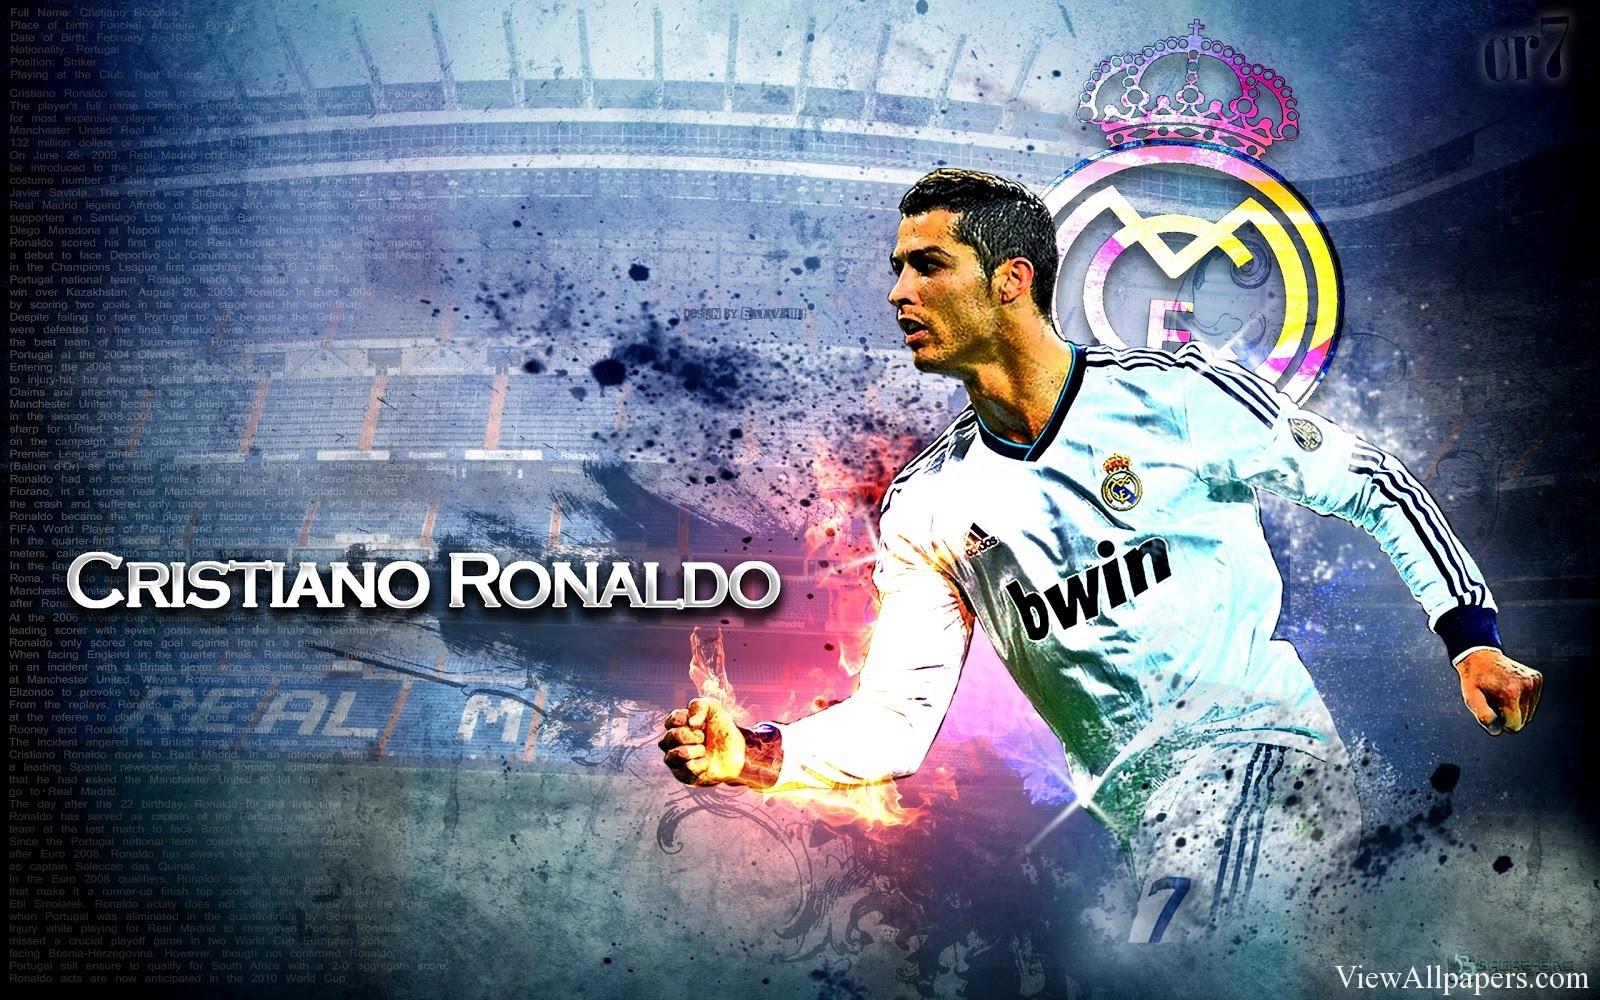 Ronaldo Wallpaper High Resolution download this CR7 2014 Ronaldo 1600x1000